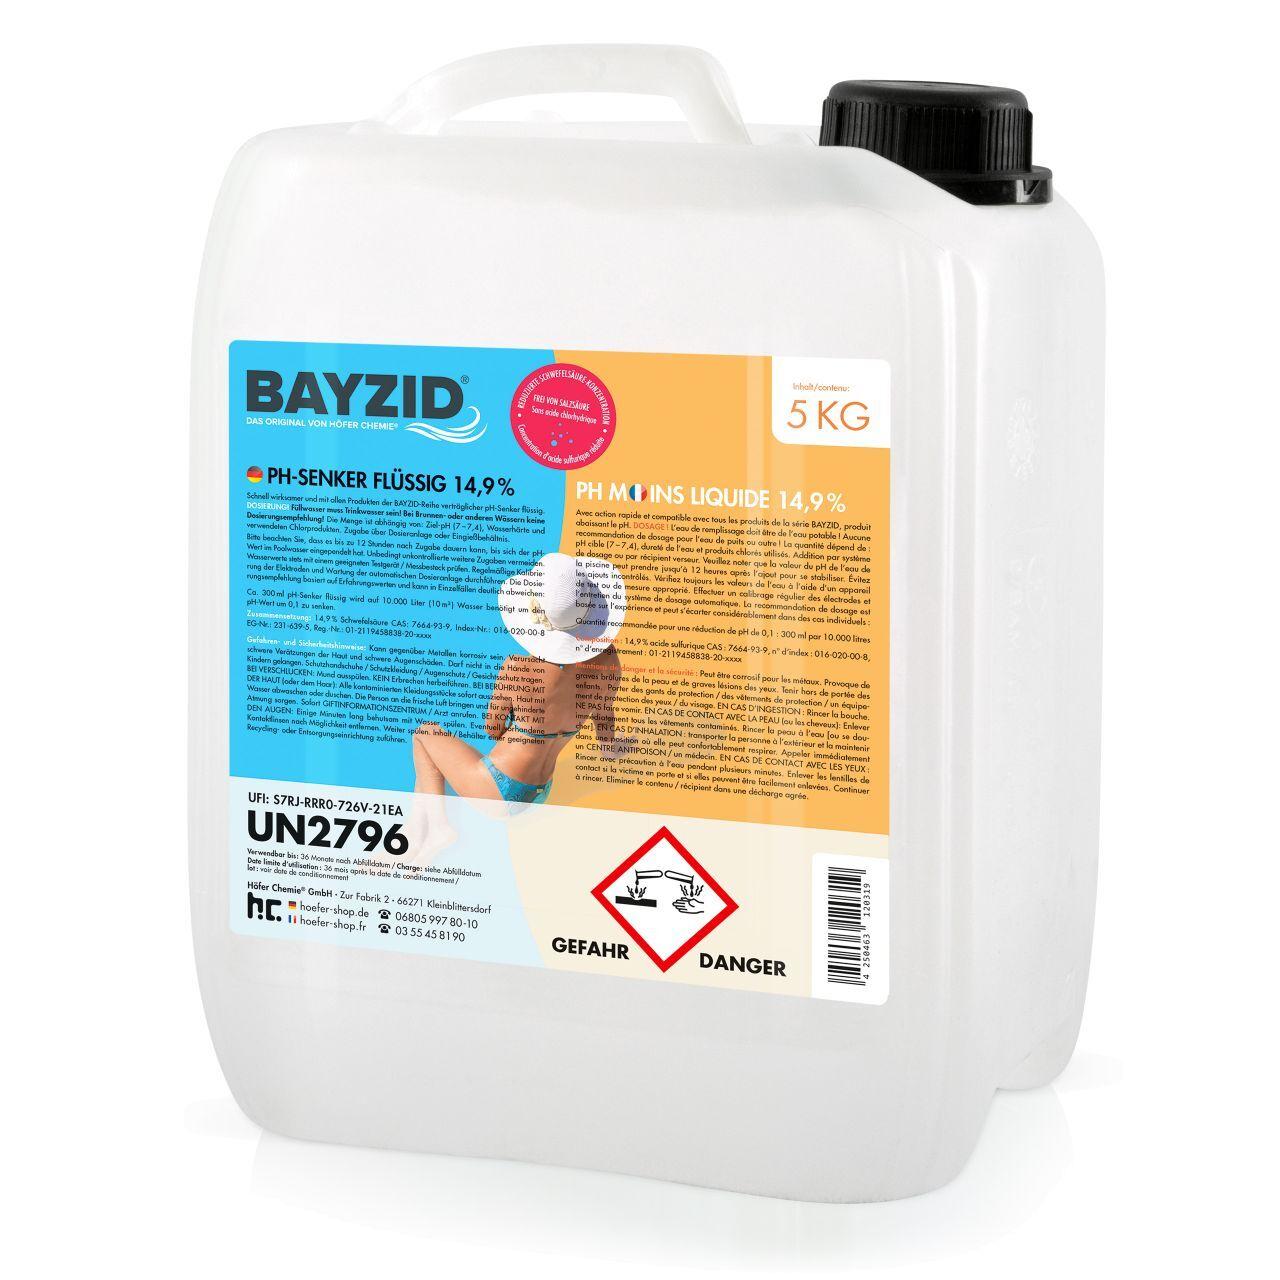 BAYZID 20 kg pH moins liquide (4 x 5 kg)